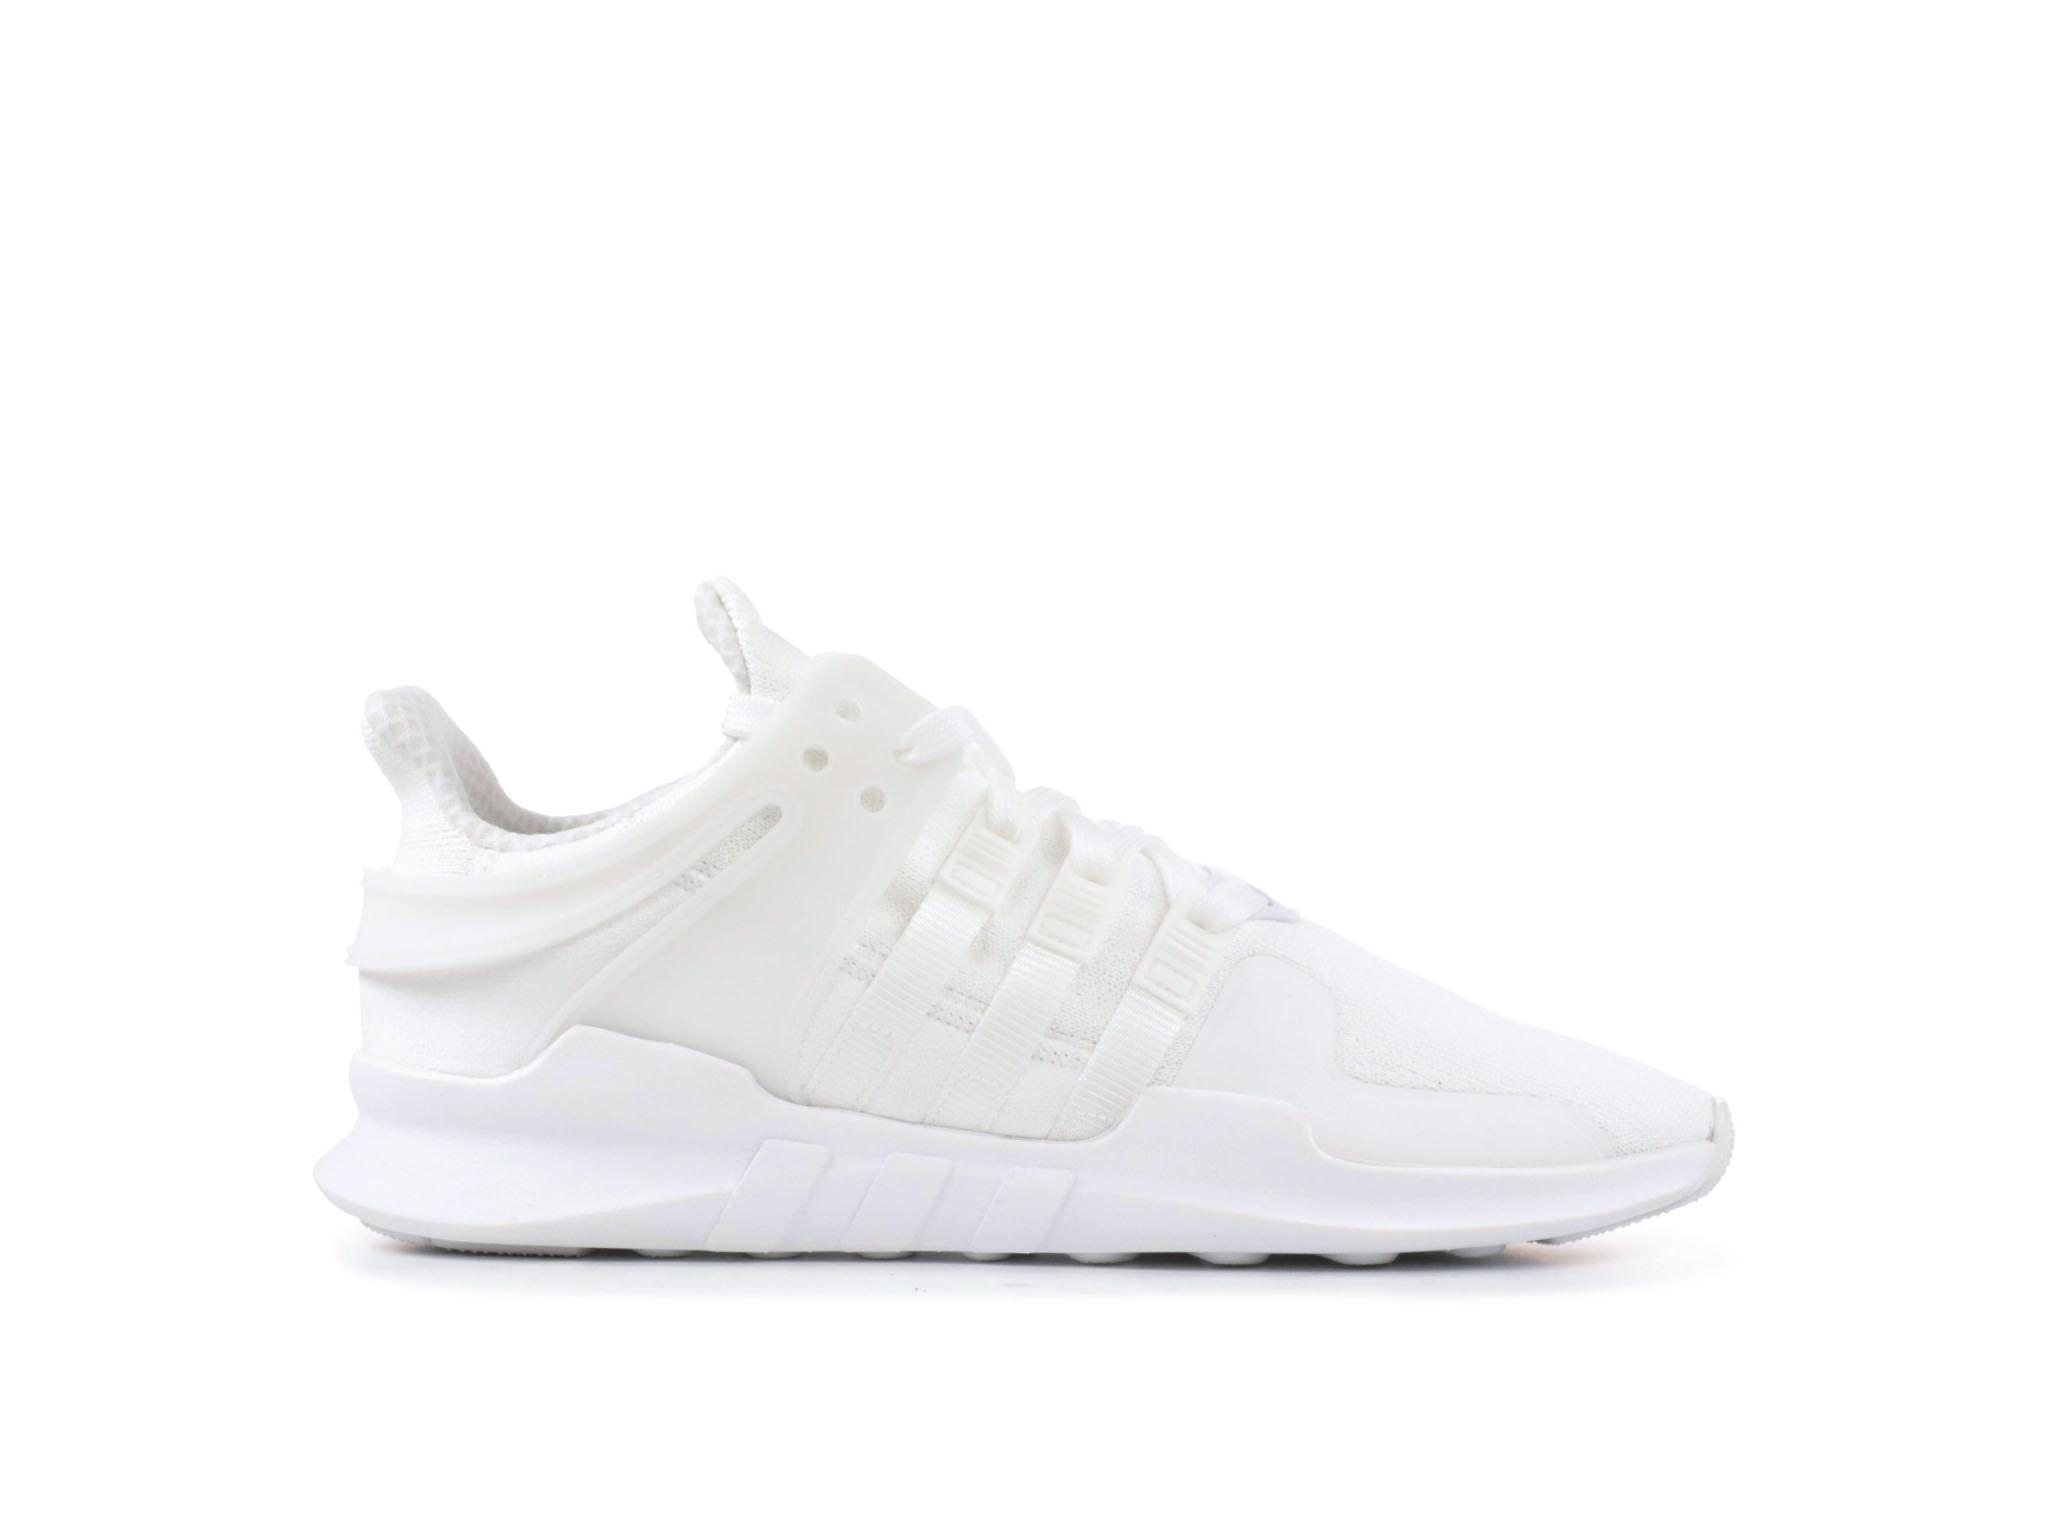 buy online 88cbb 90e42 Shop Triple White EQT Support ADV Online | Laced